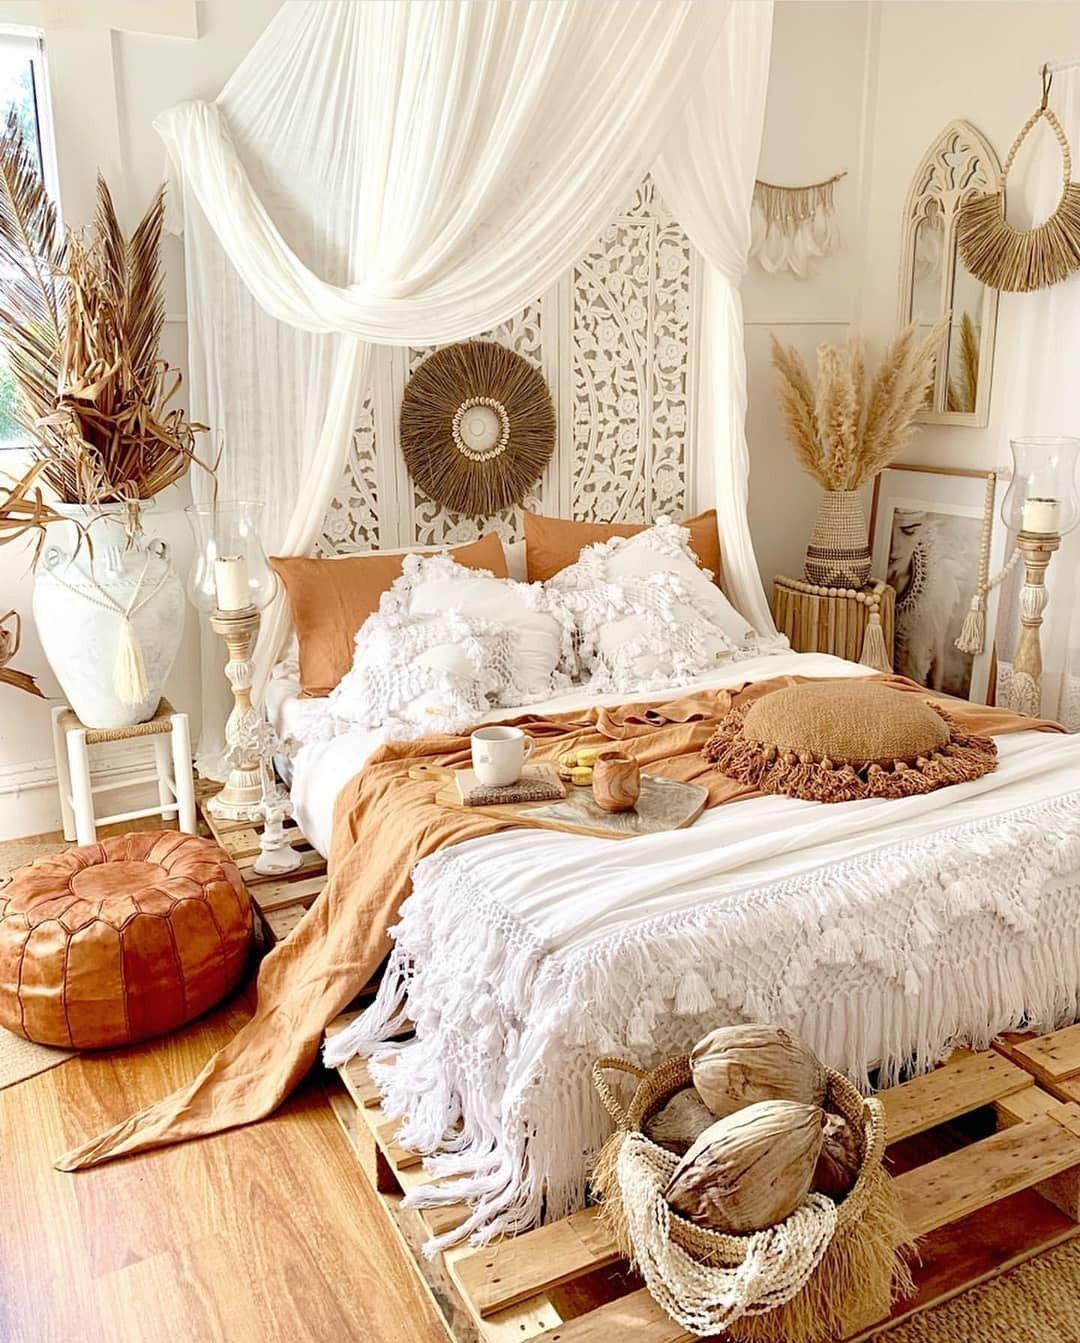 Bohemian Style Ideas For Bedroom Decor #woonaccessoires